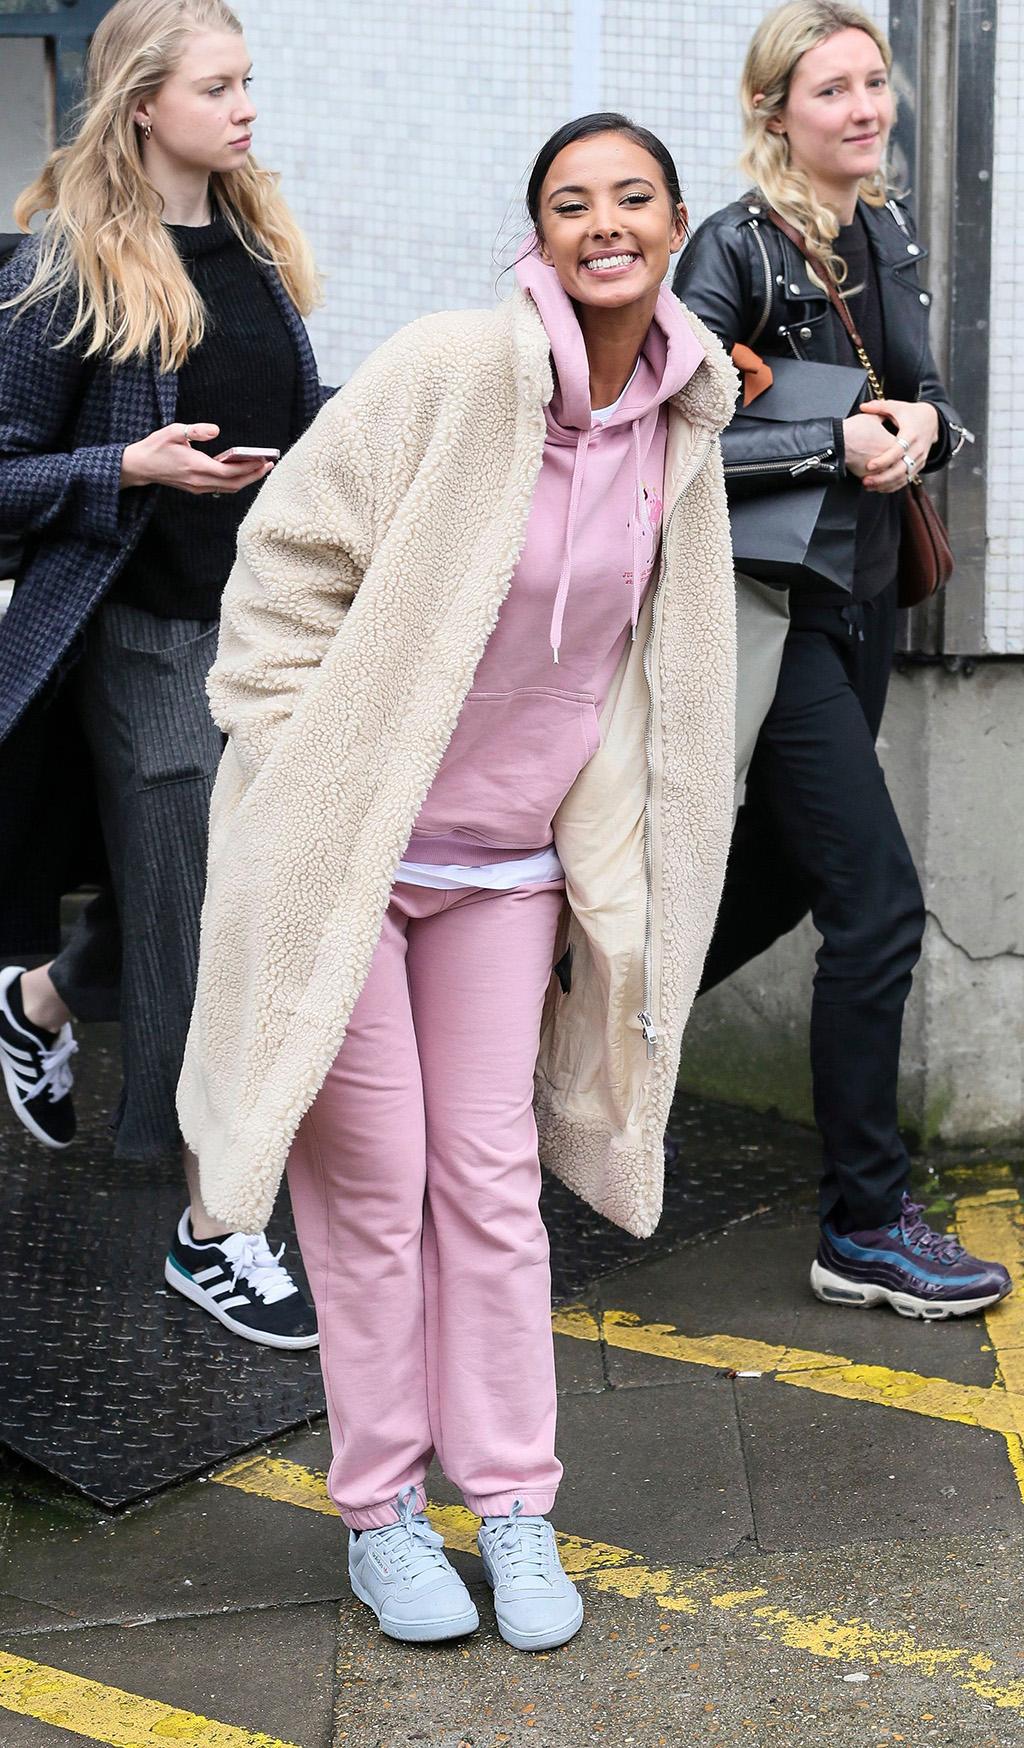 Maya JamaCelebrities at the ITV studios, London, UK - 19 February 2018. WEARING HIGH-STREET WEEKDAY COAT AND OPENING CEREMONY TRACKSUIT SHOES BY YEEZY X ADIDAS